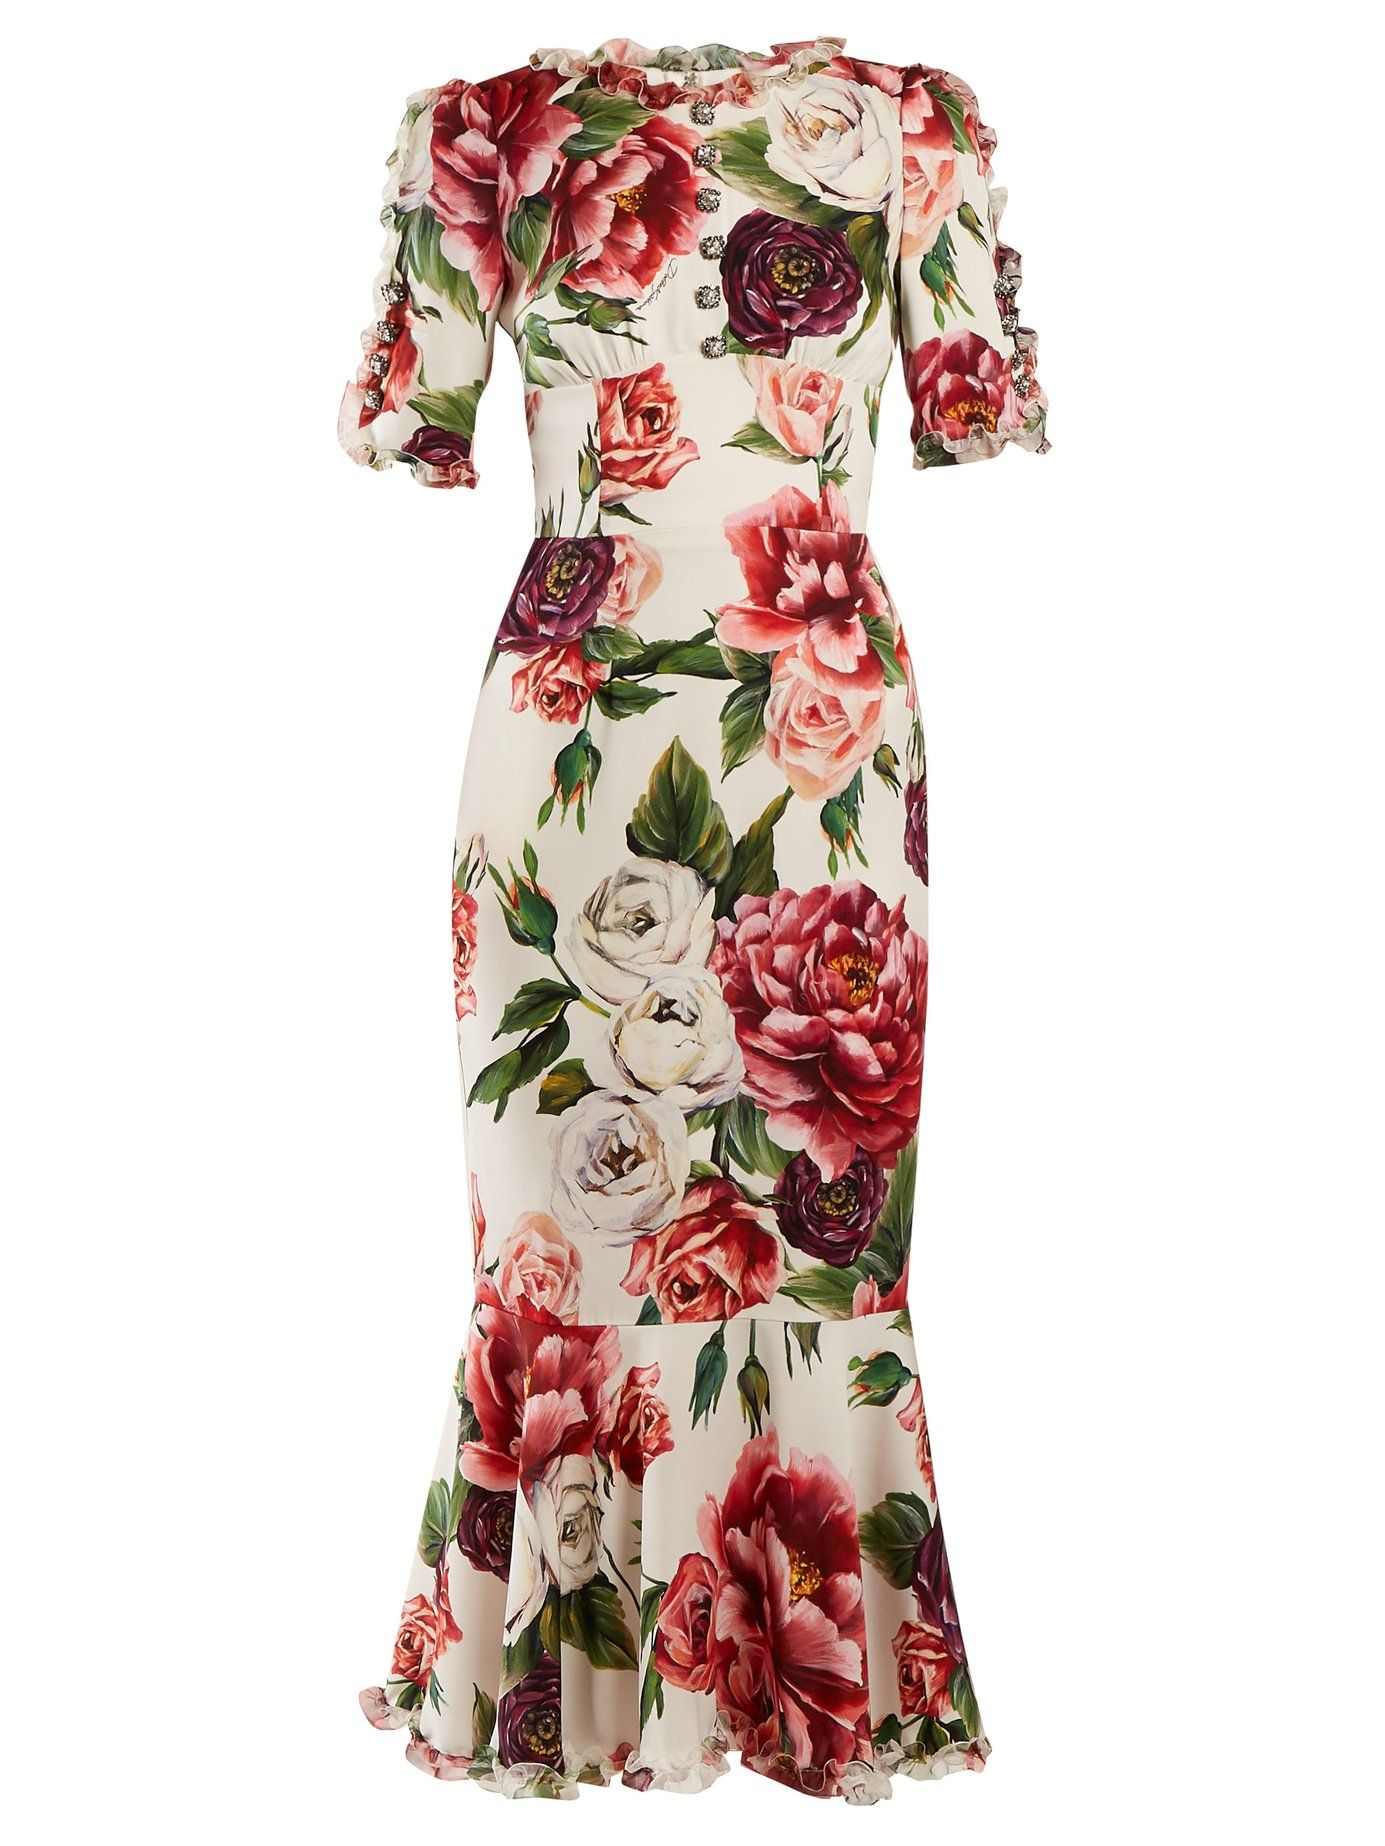 Peony-print silk-charmeuse dress   Dolce & Gabbana   MATCHESFASHION.COM US